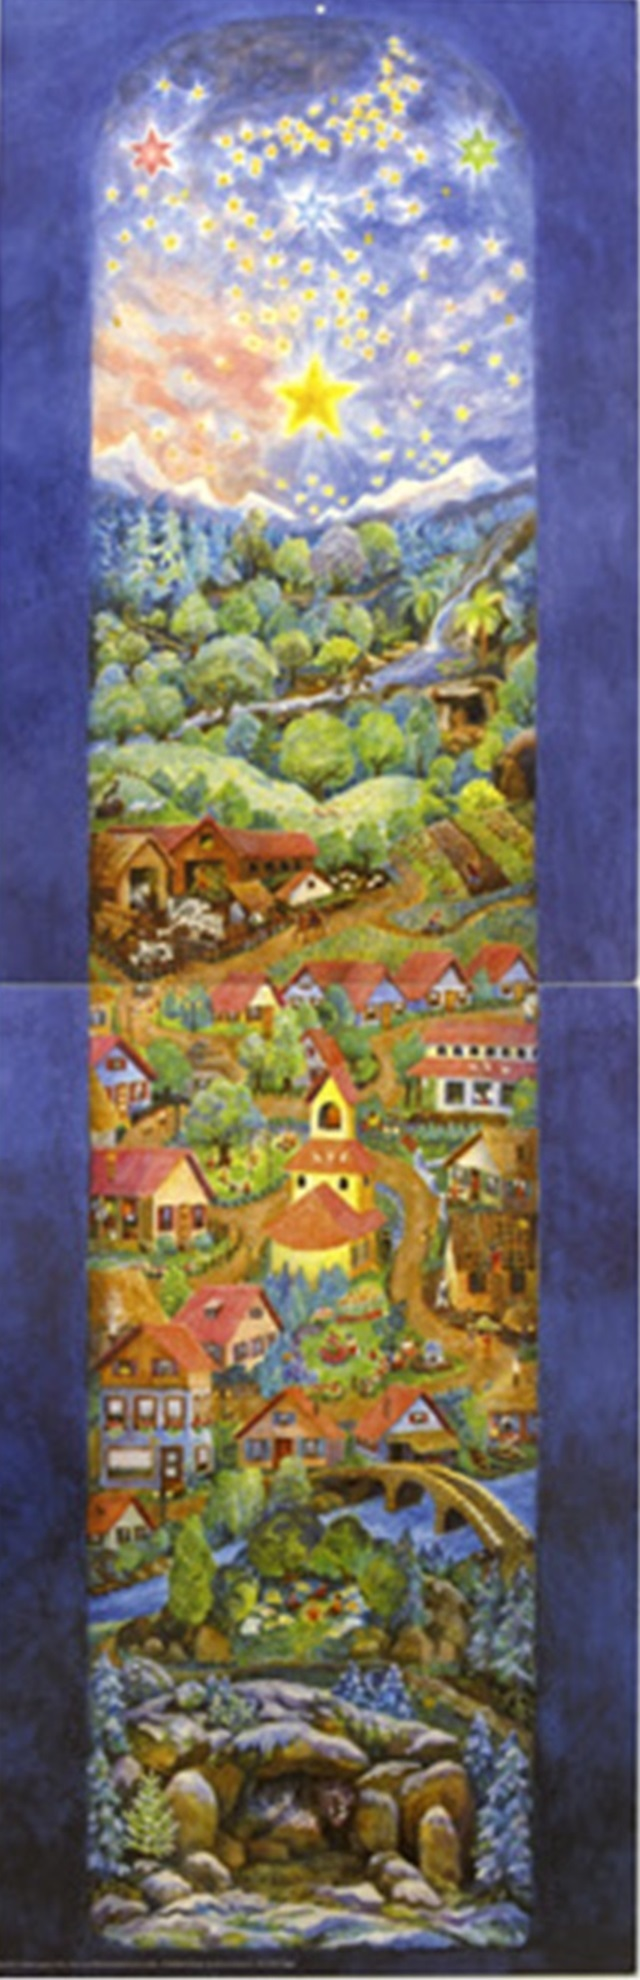 【561-H】Rafferel-Verlag/アドベントカレンダー(A011)/アドヴェントカレンダー